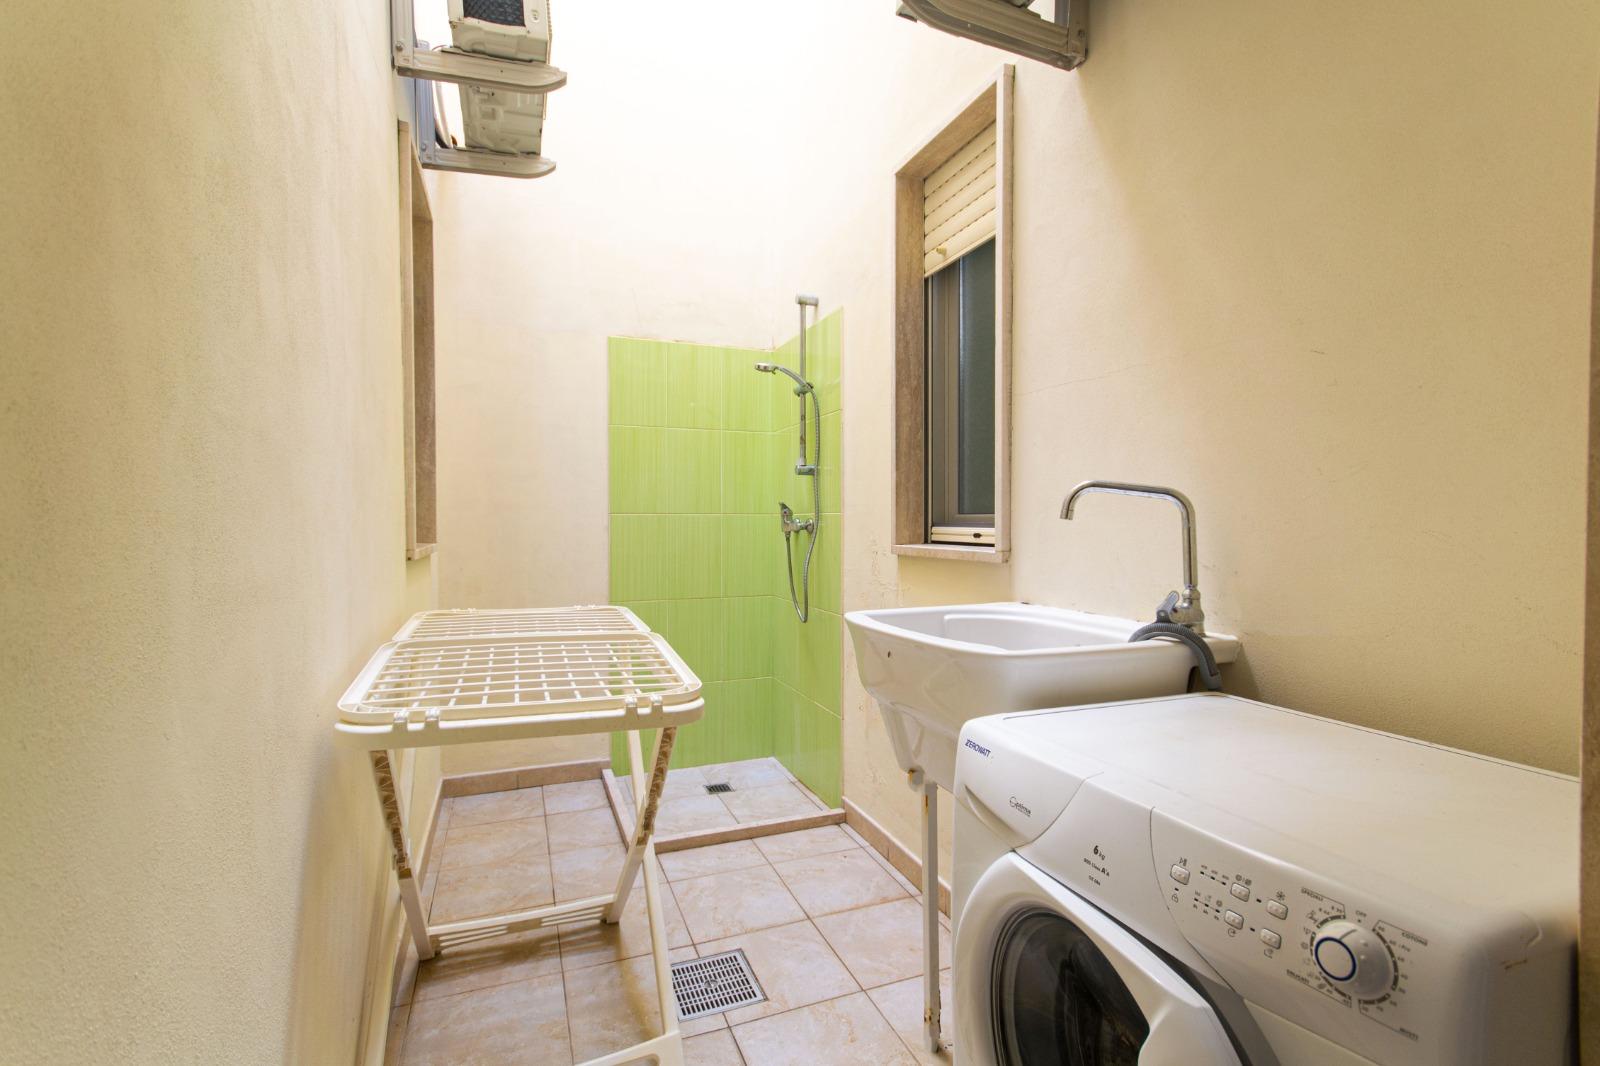 505_appartamento-volta_11._angolo_lavanderia.jpg